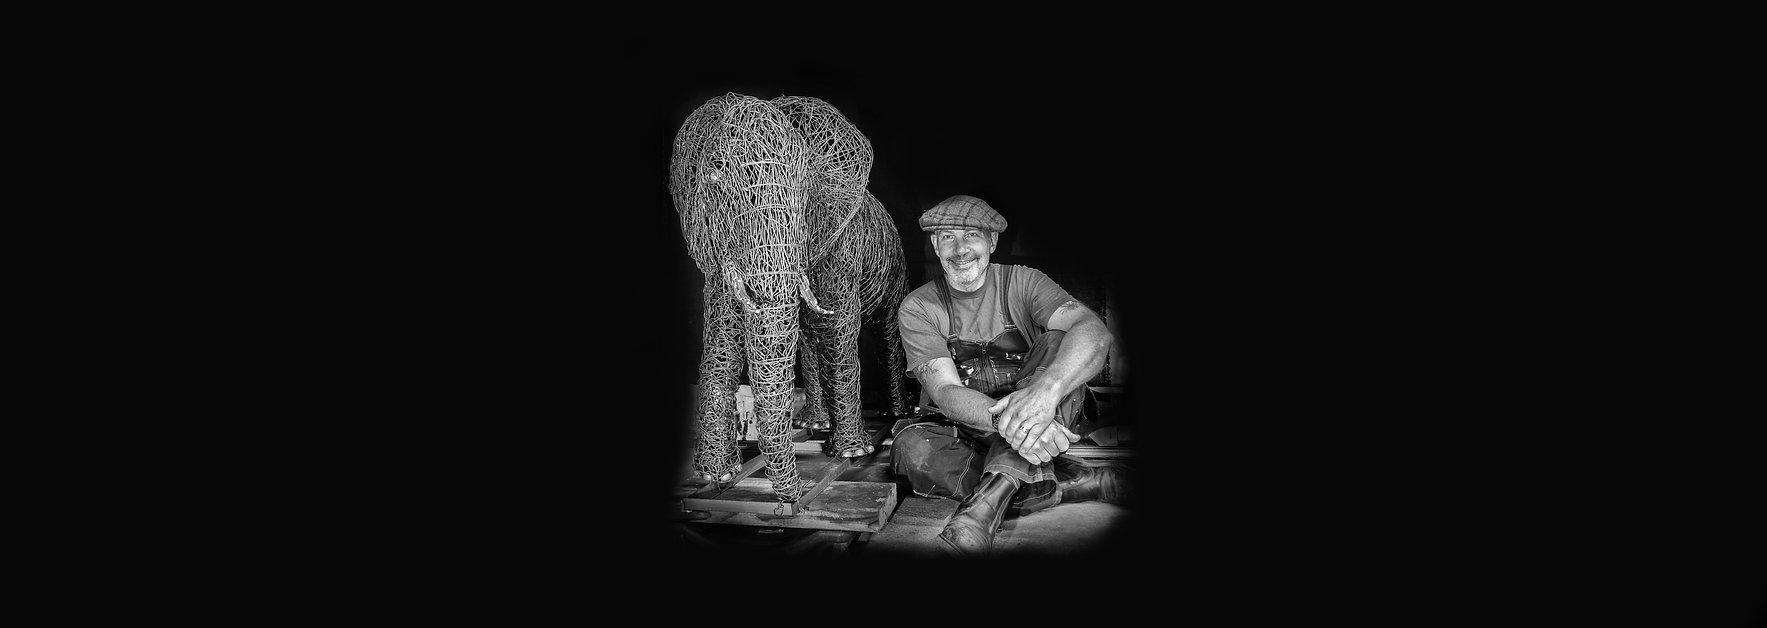 Mark irwin sculpture.jpg